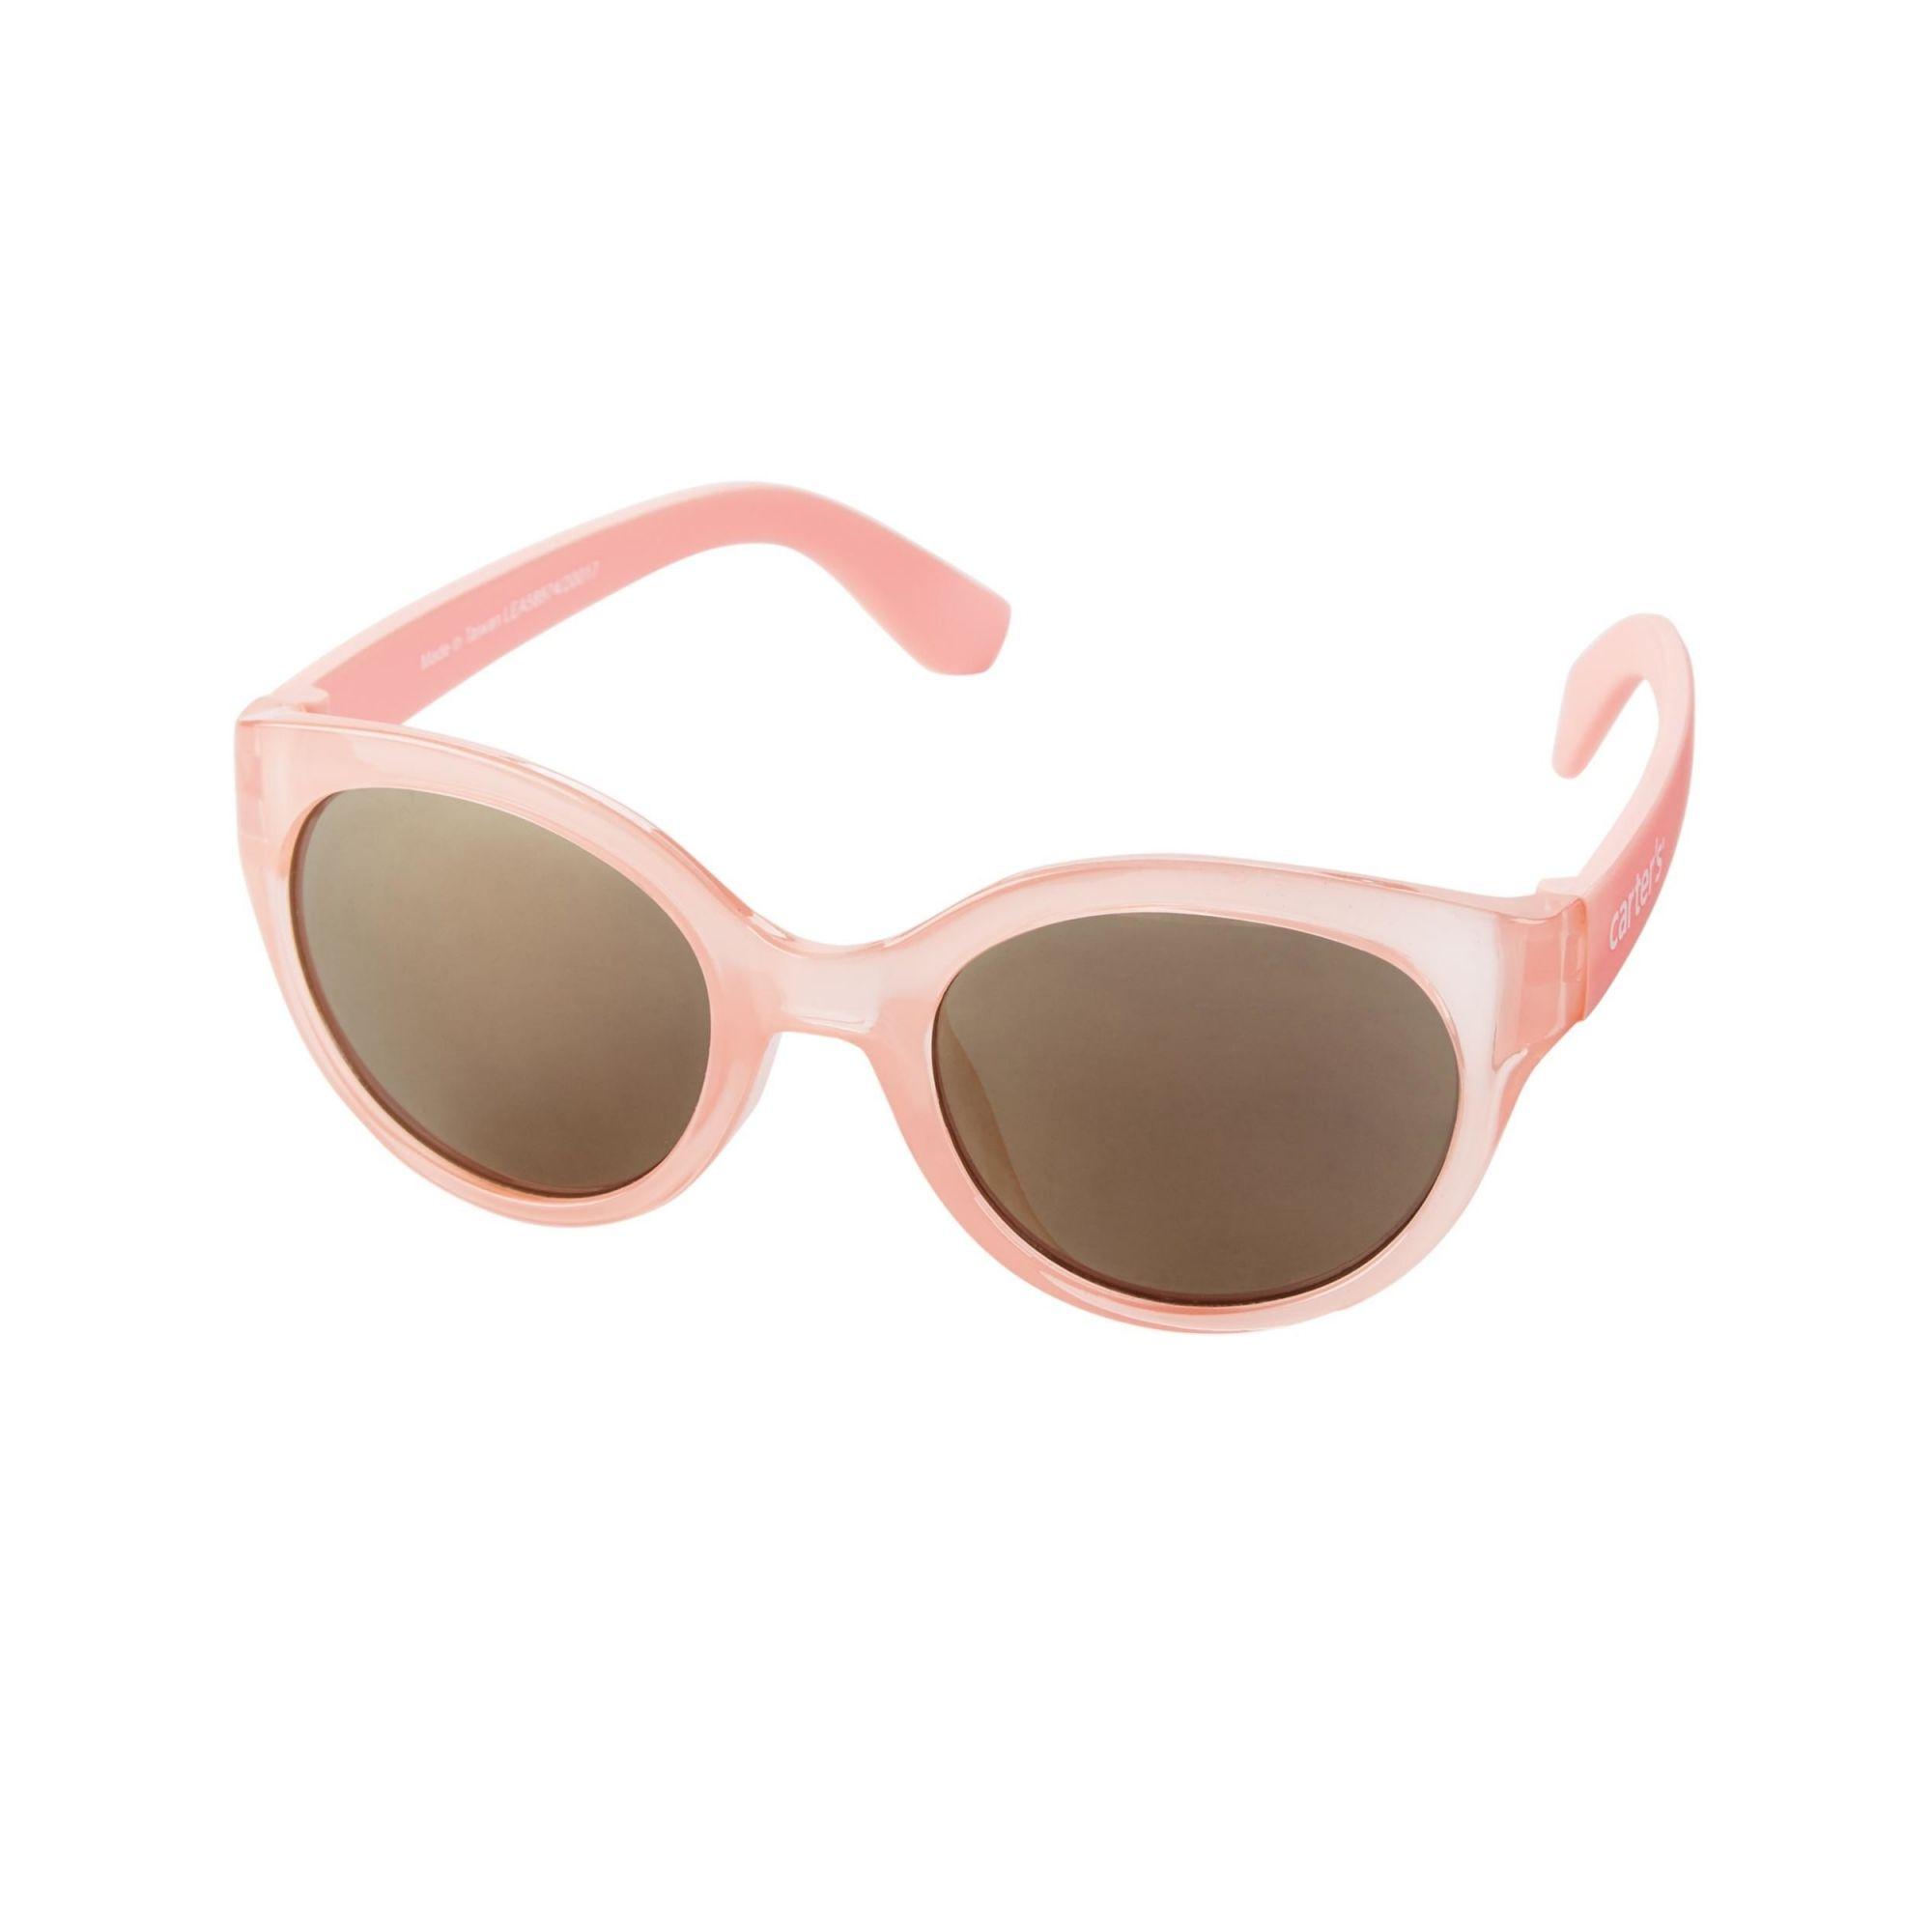 Oculos Carters Infantil - 0 a 24 meses - CR04175-Acessórios - Le ... 3129e4f4a8